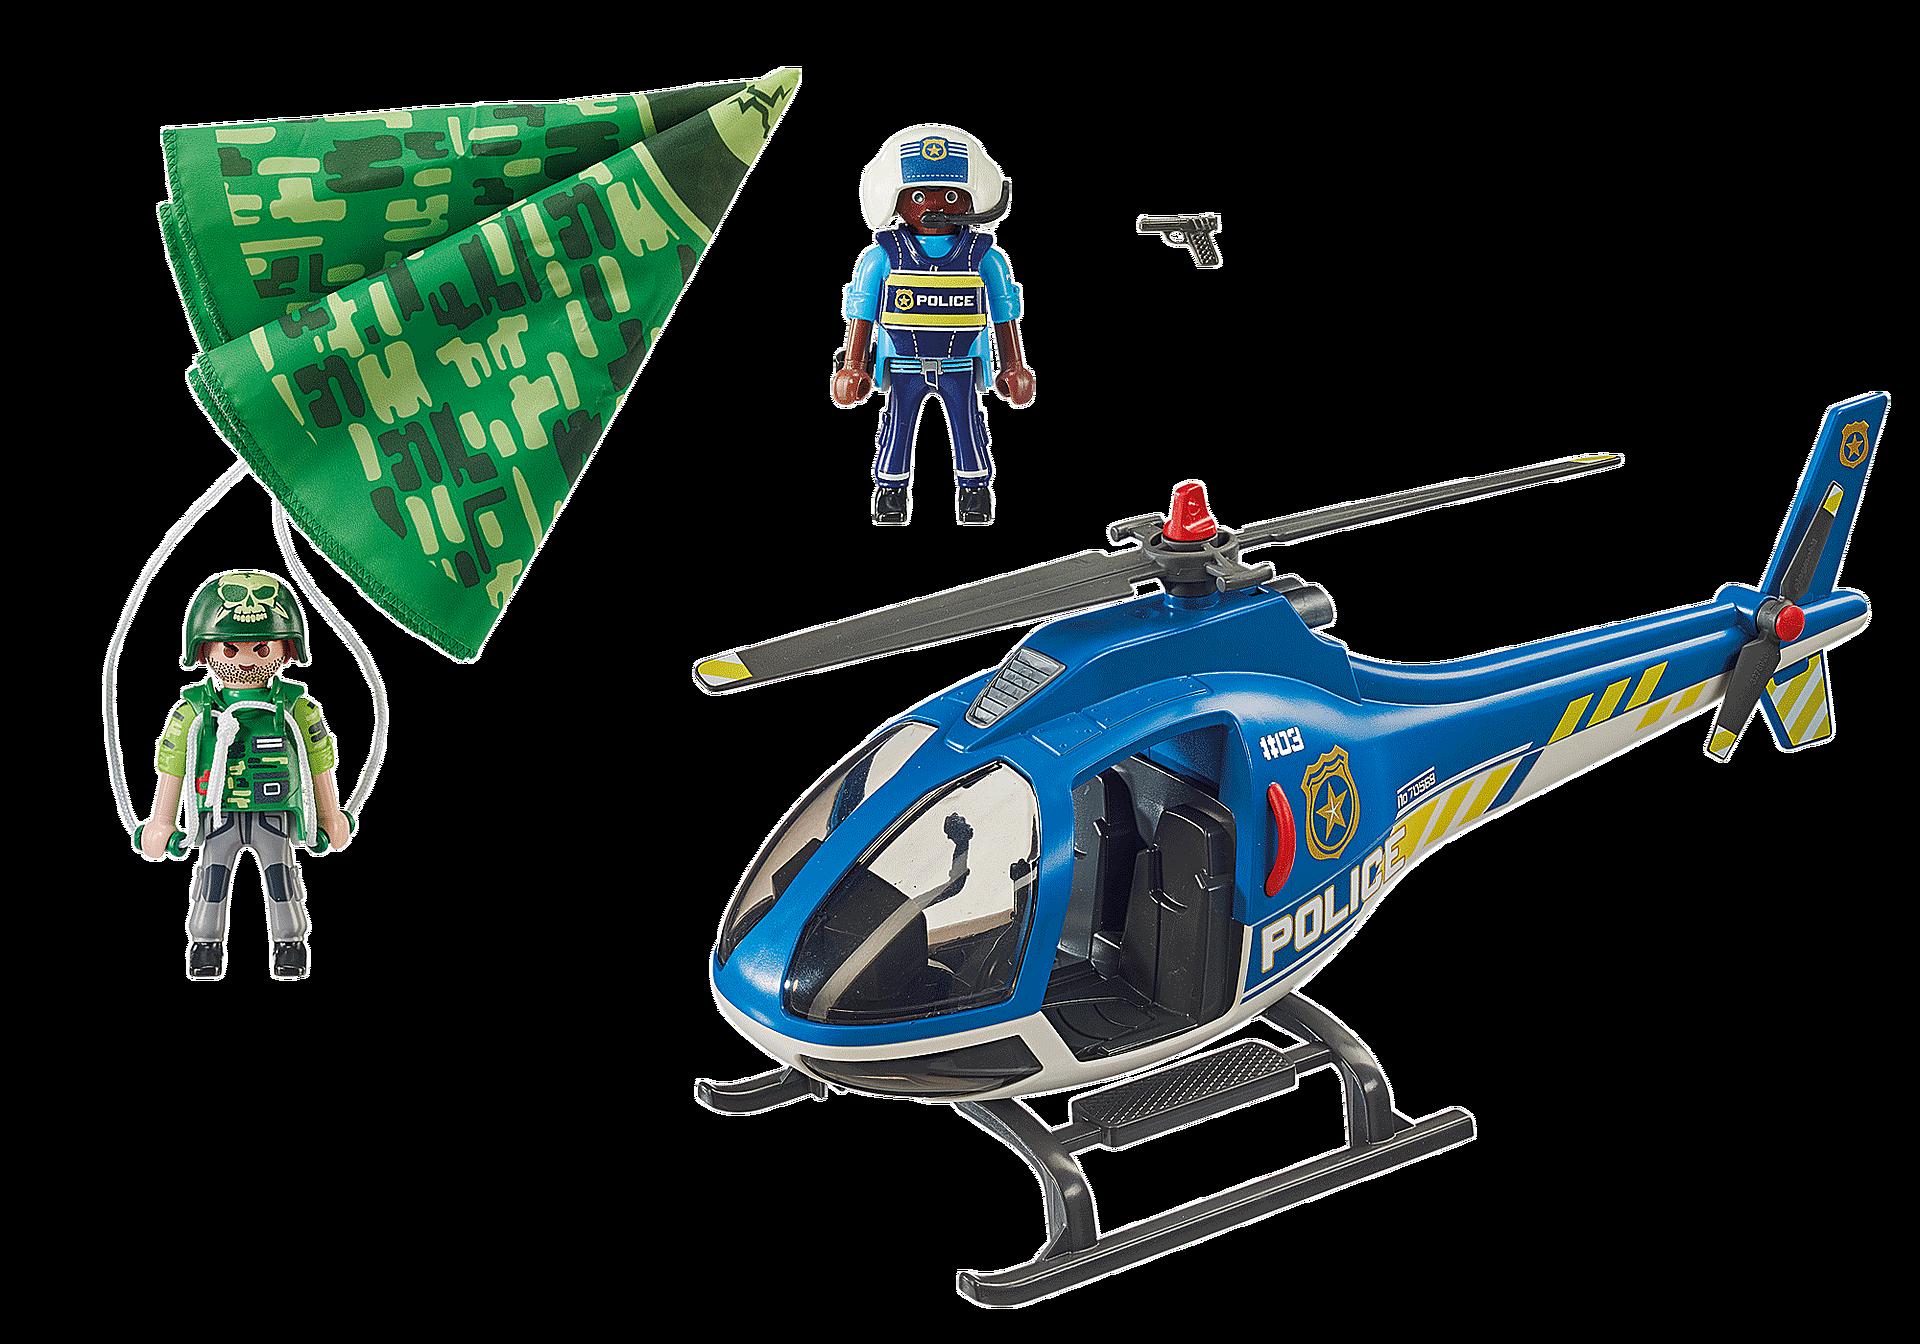 70569 Helicóptero de Policía: persecución en paracaídas zoom image3